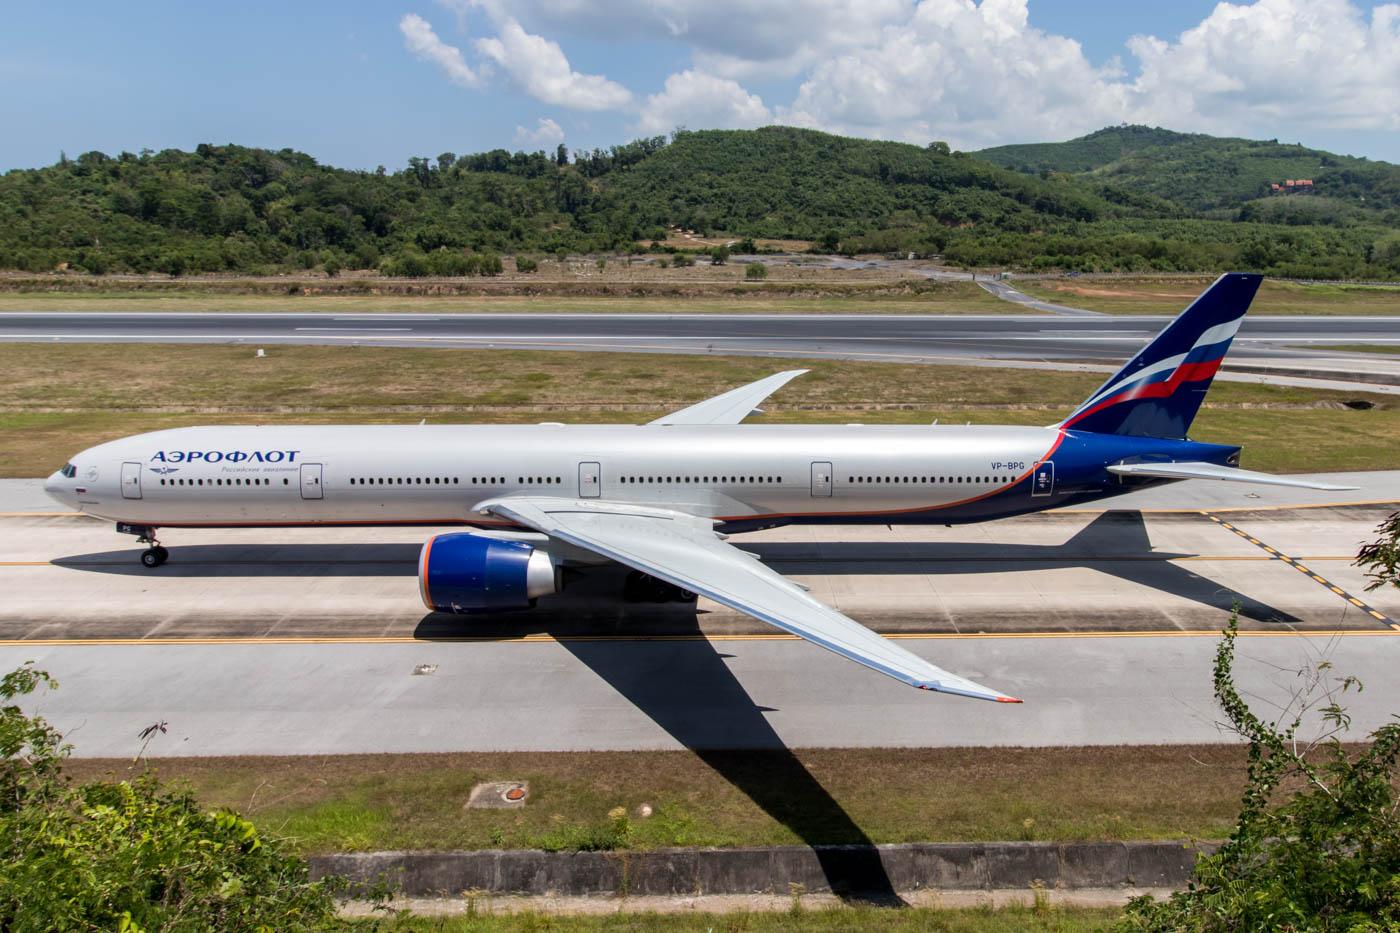 Aeroflot 777-300ER at Phuket Airport